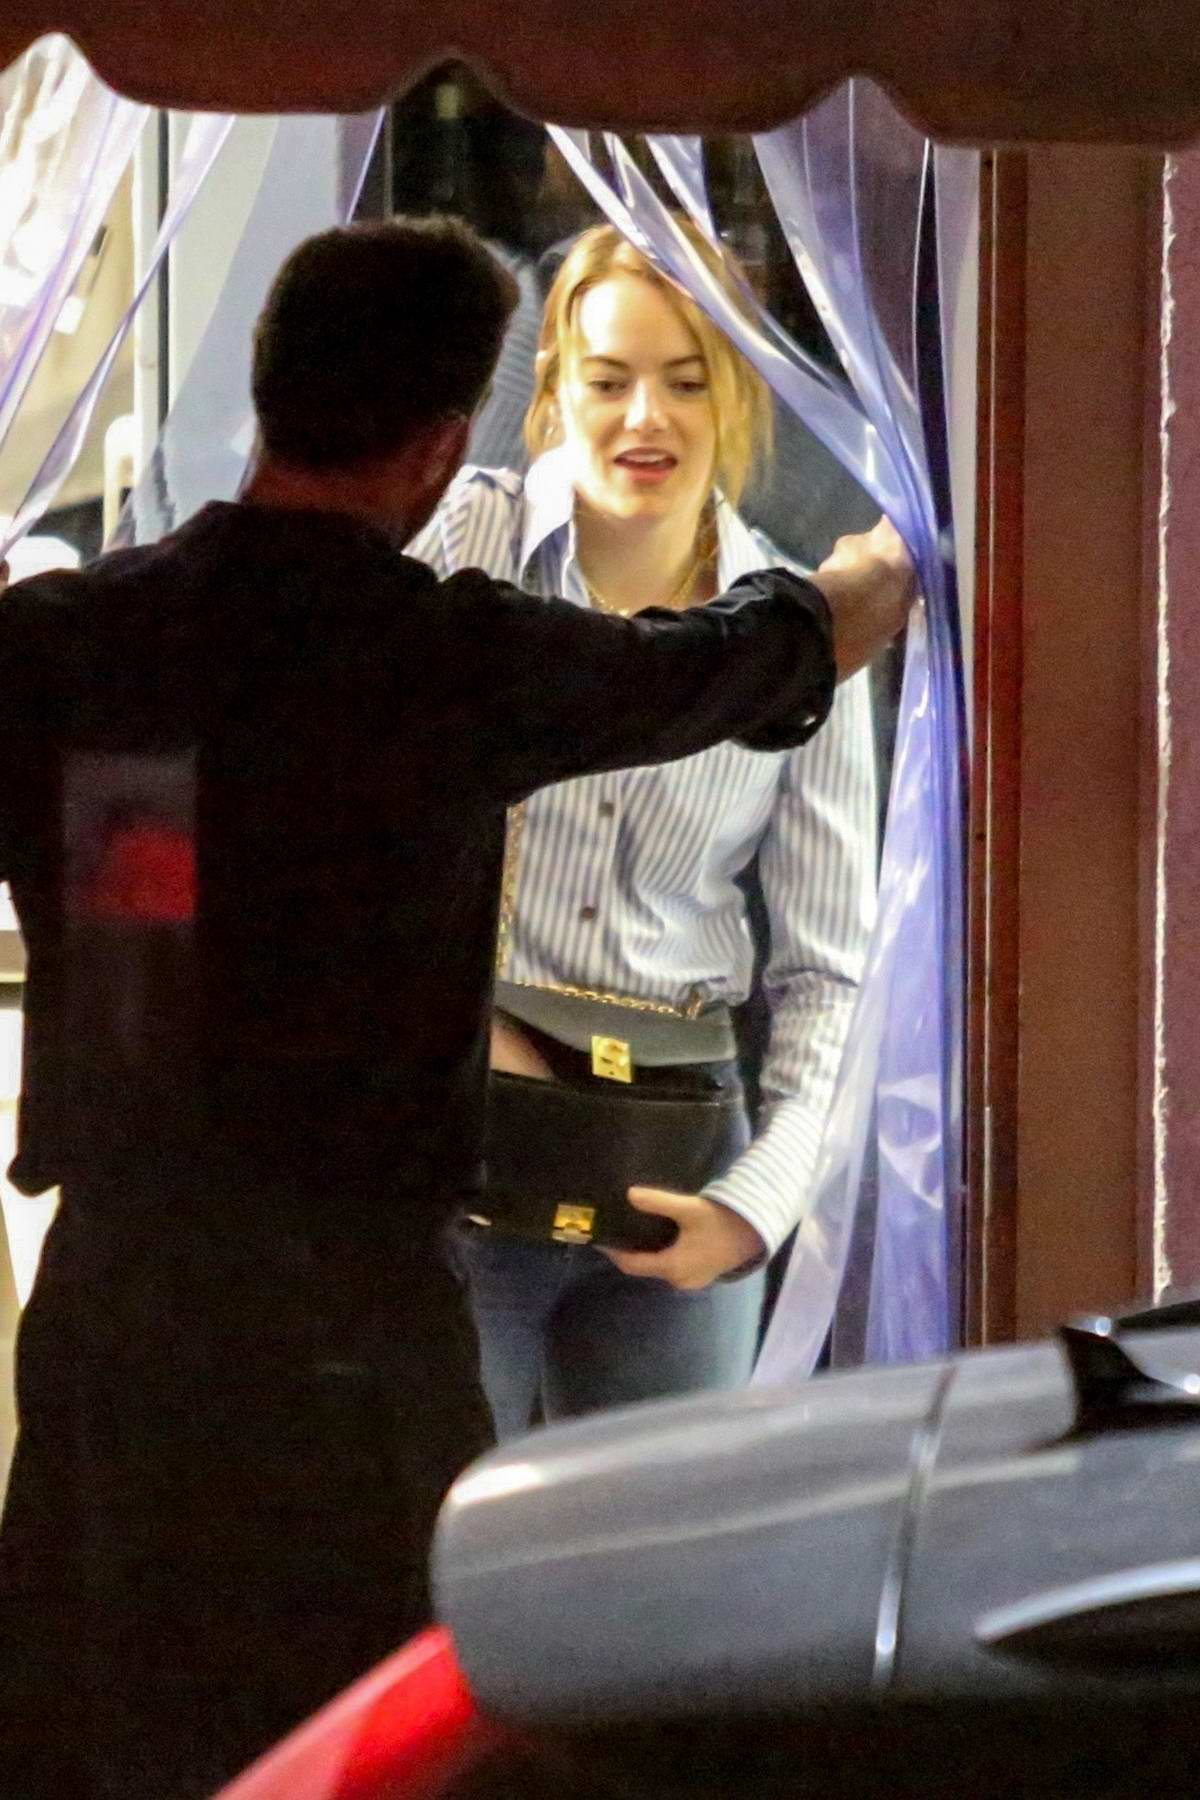 Emma Stone seen leaving after dinner with friends at Giorgio Baldi in Santa Monica, California